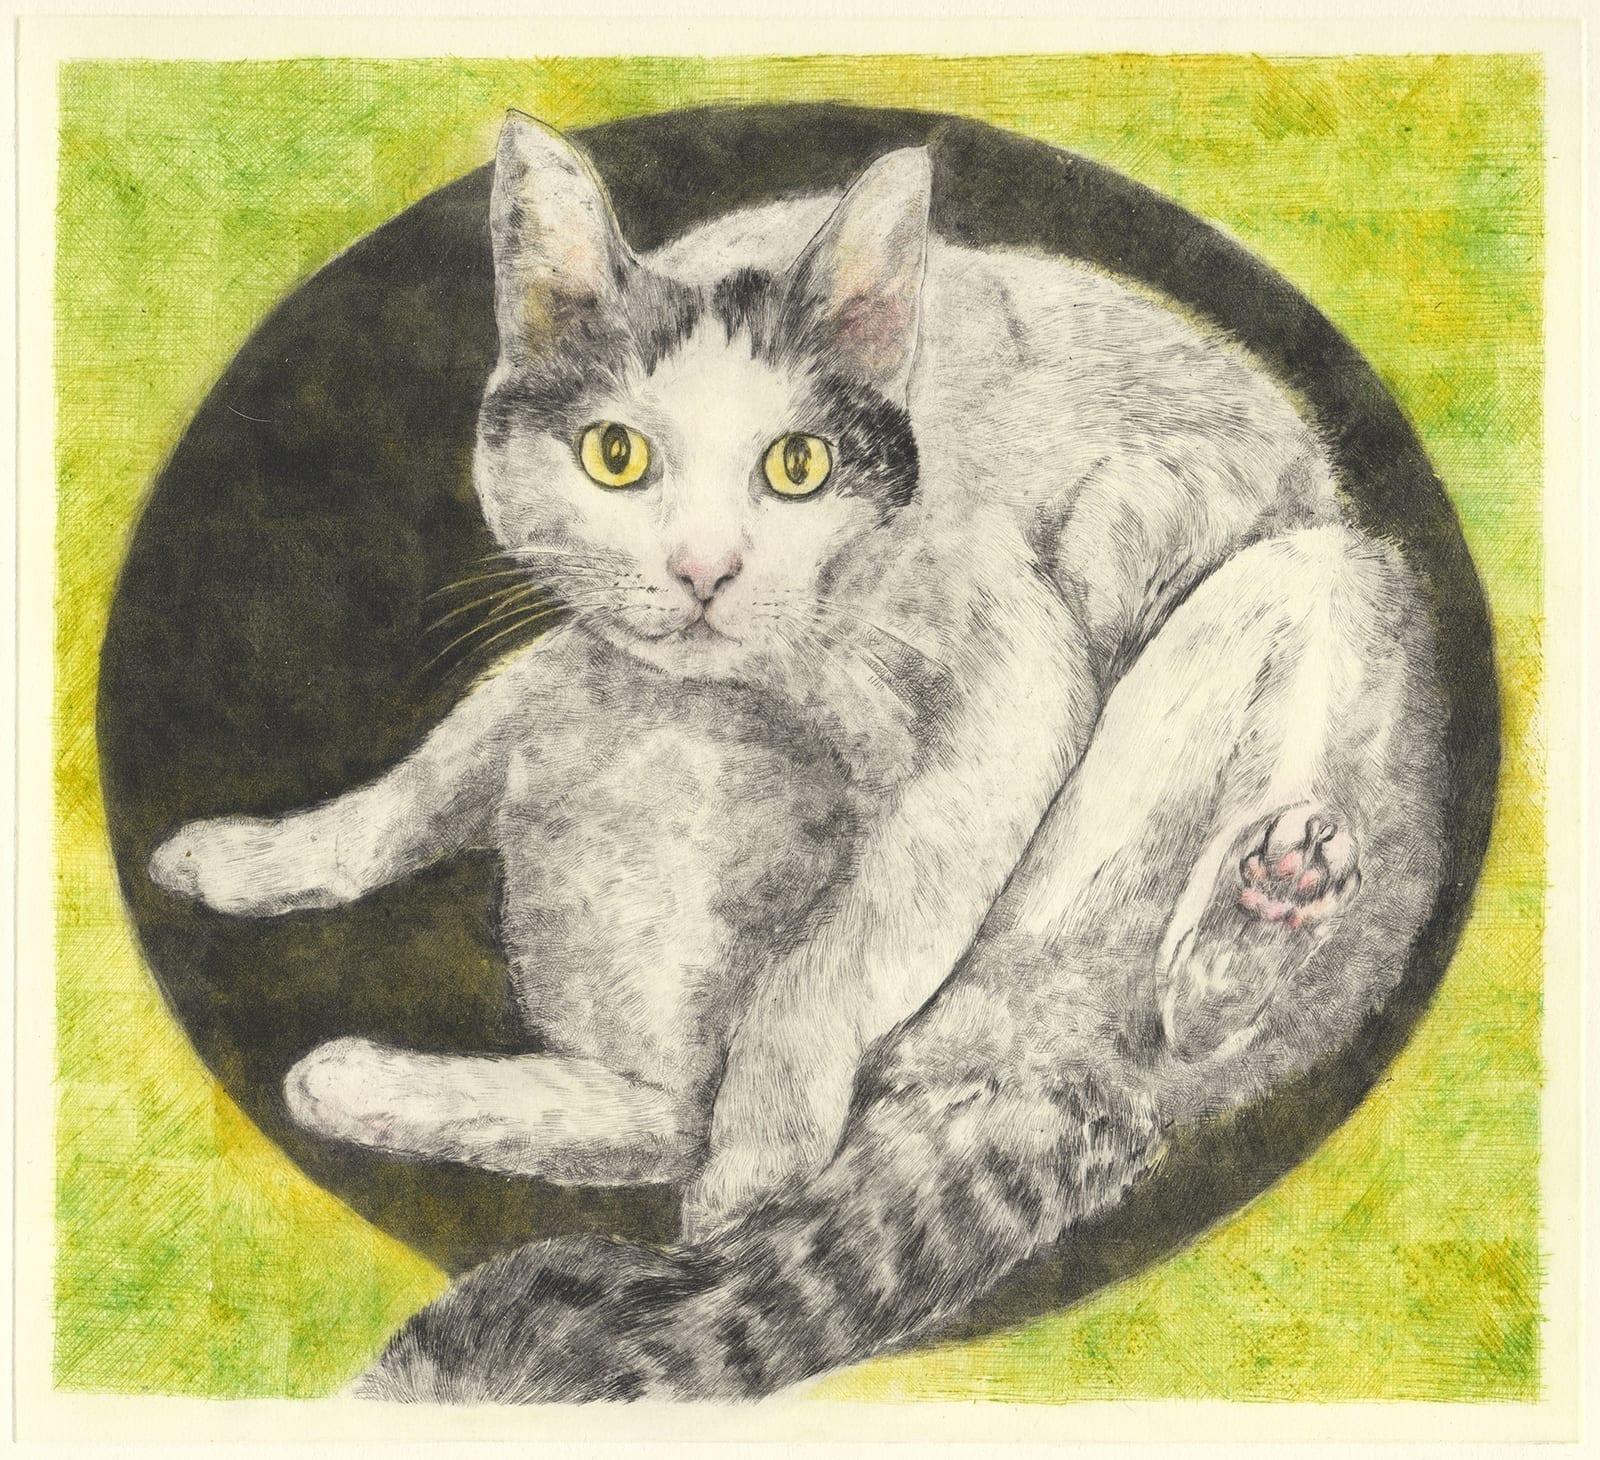 Kawaii Hachi (drypoint etching by Yaemi Shigyo)